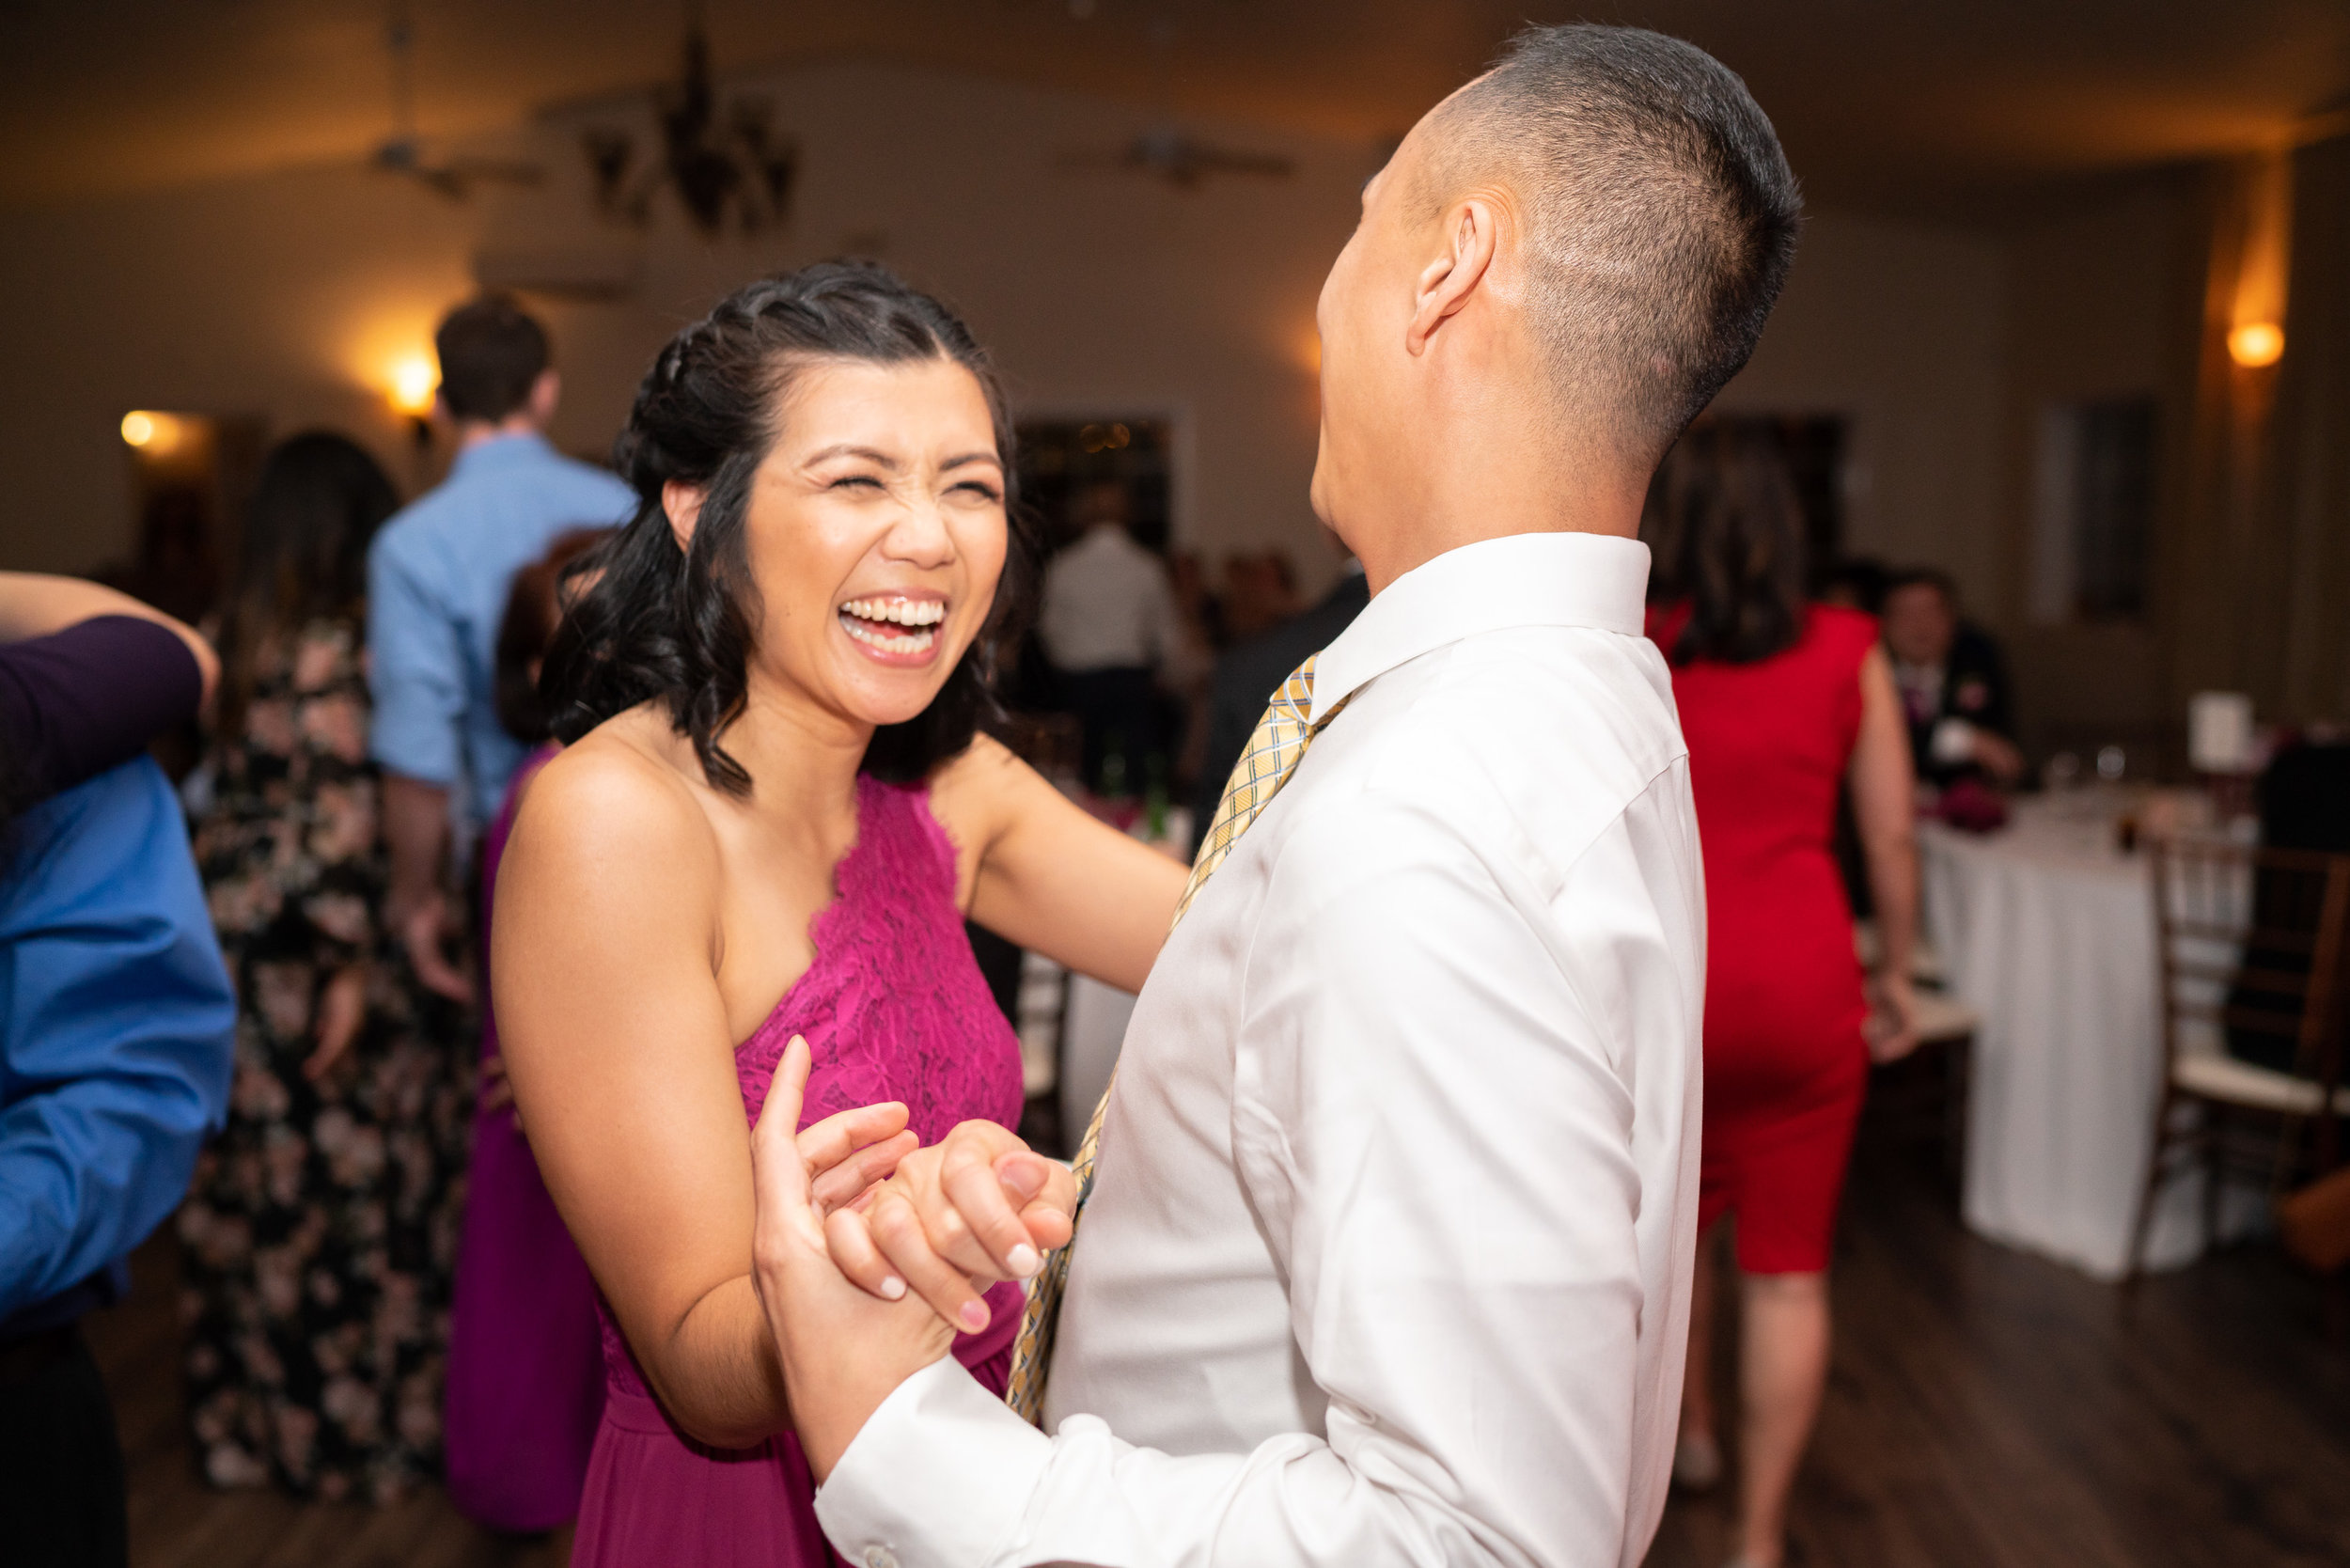 Wedding reception photos at Harvest House in Leesburg Virginia